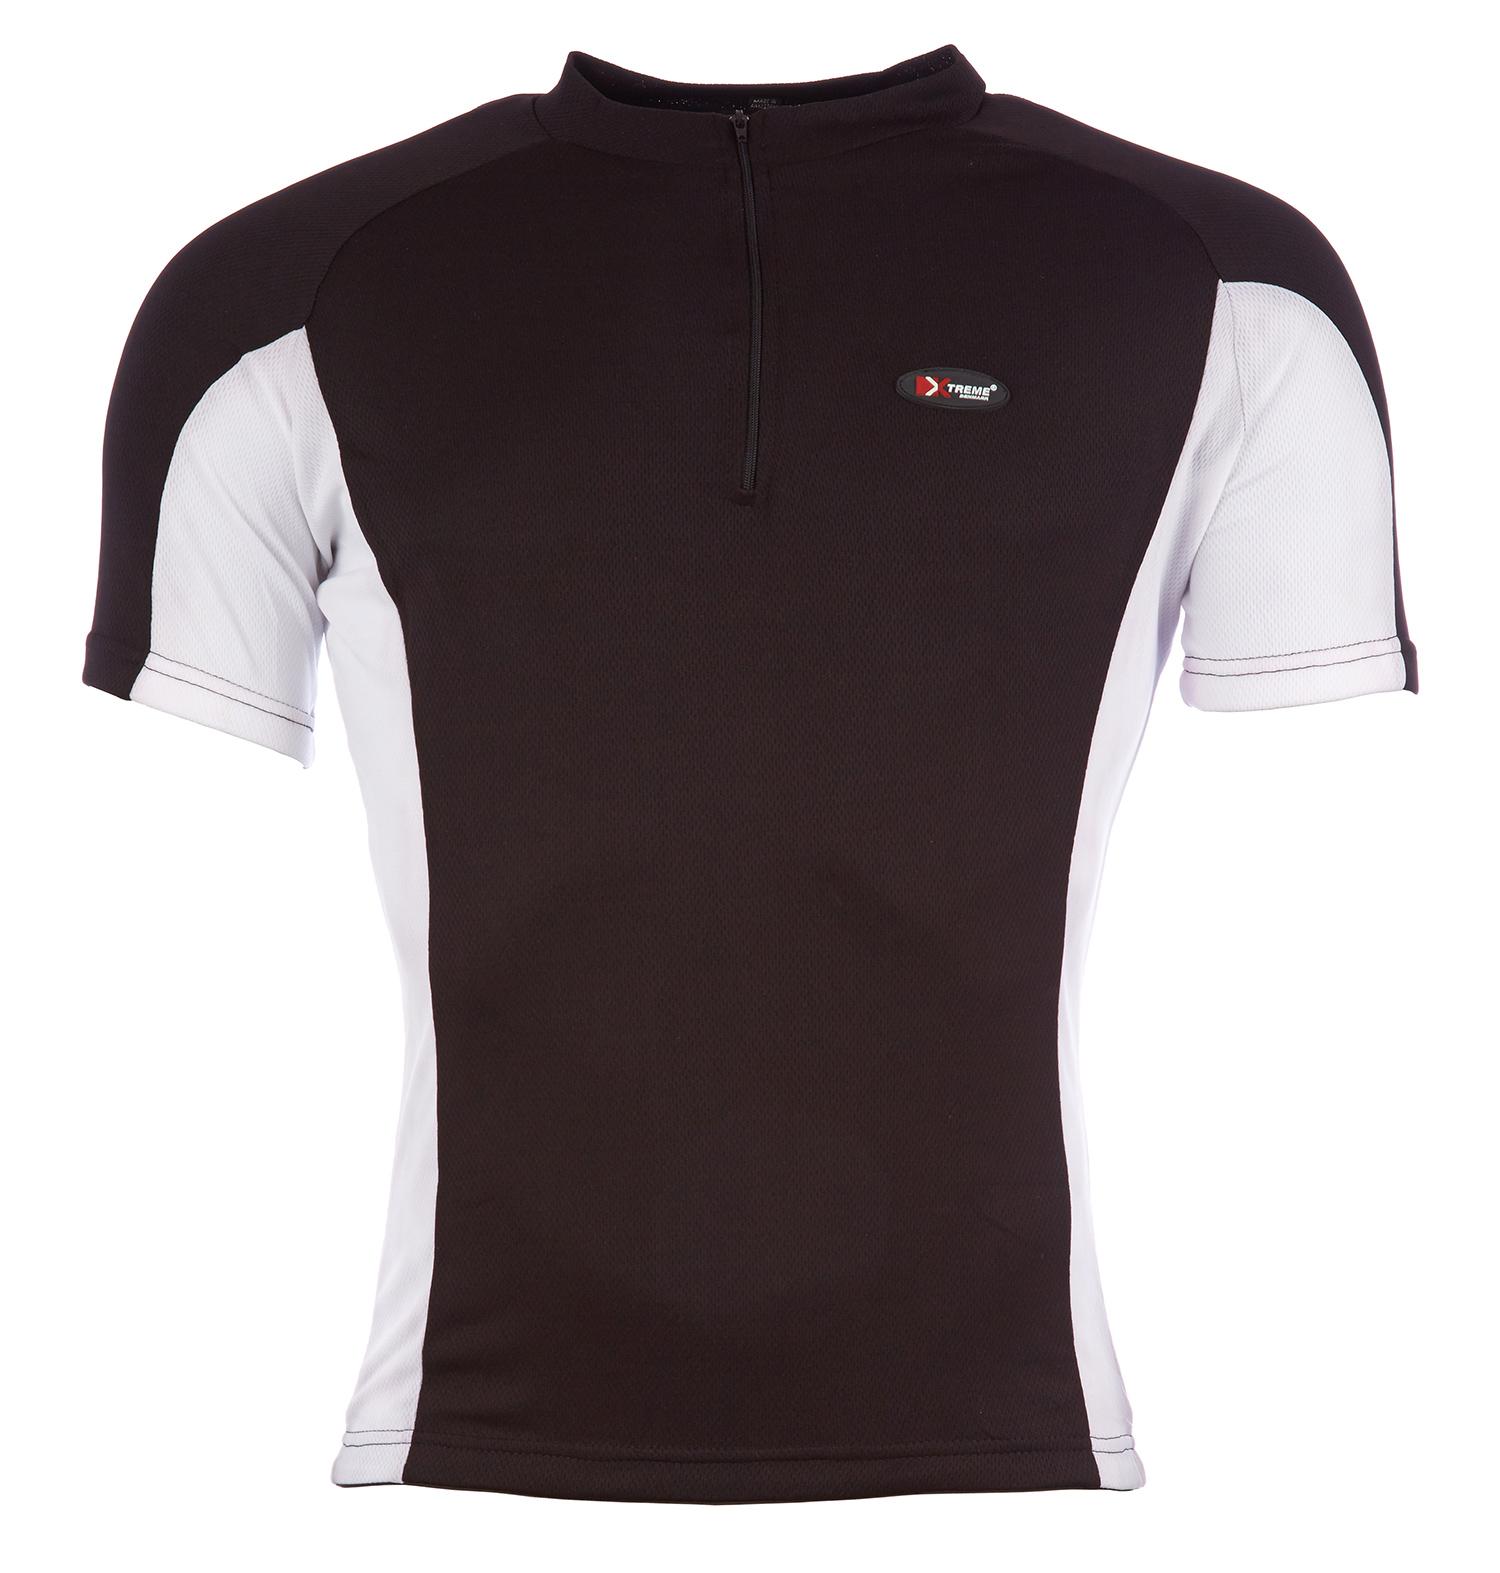 Bluse Xtreme X-Fun Sort/Hvid | Jerseys